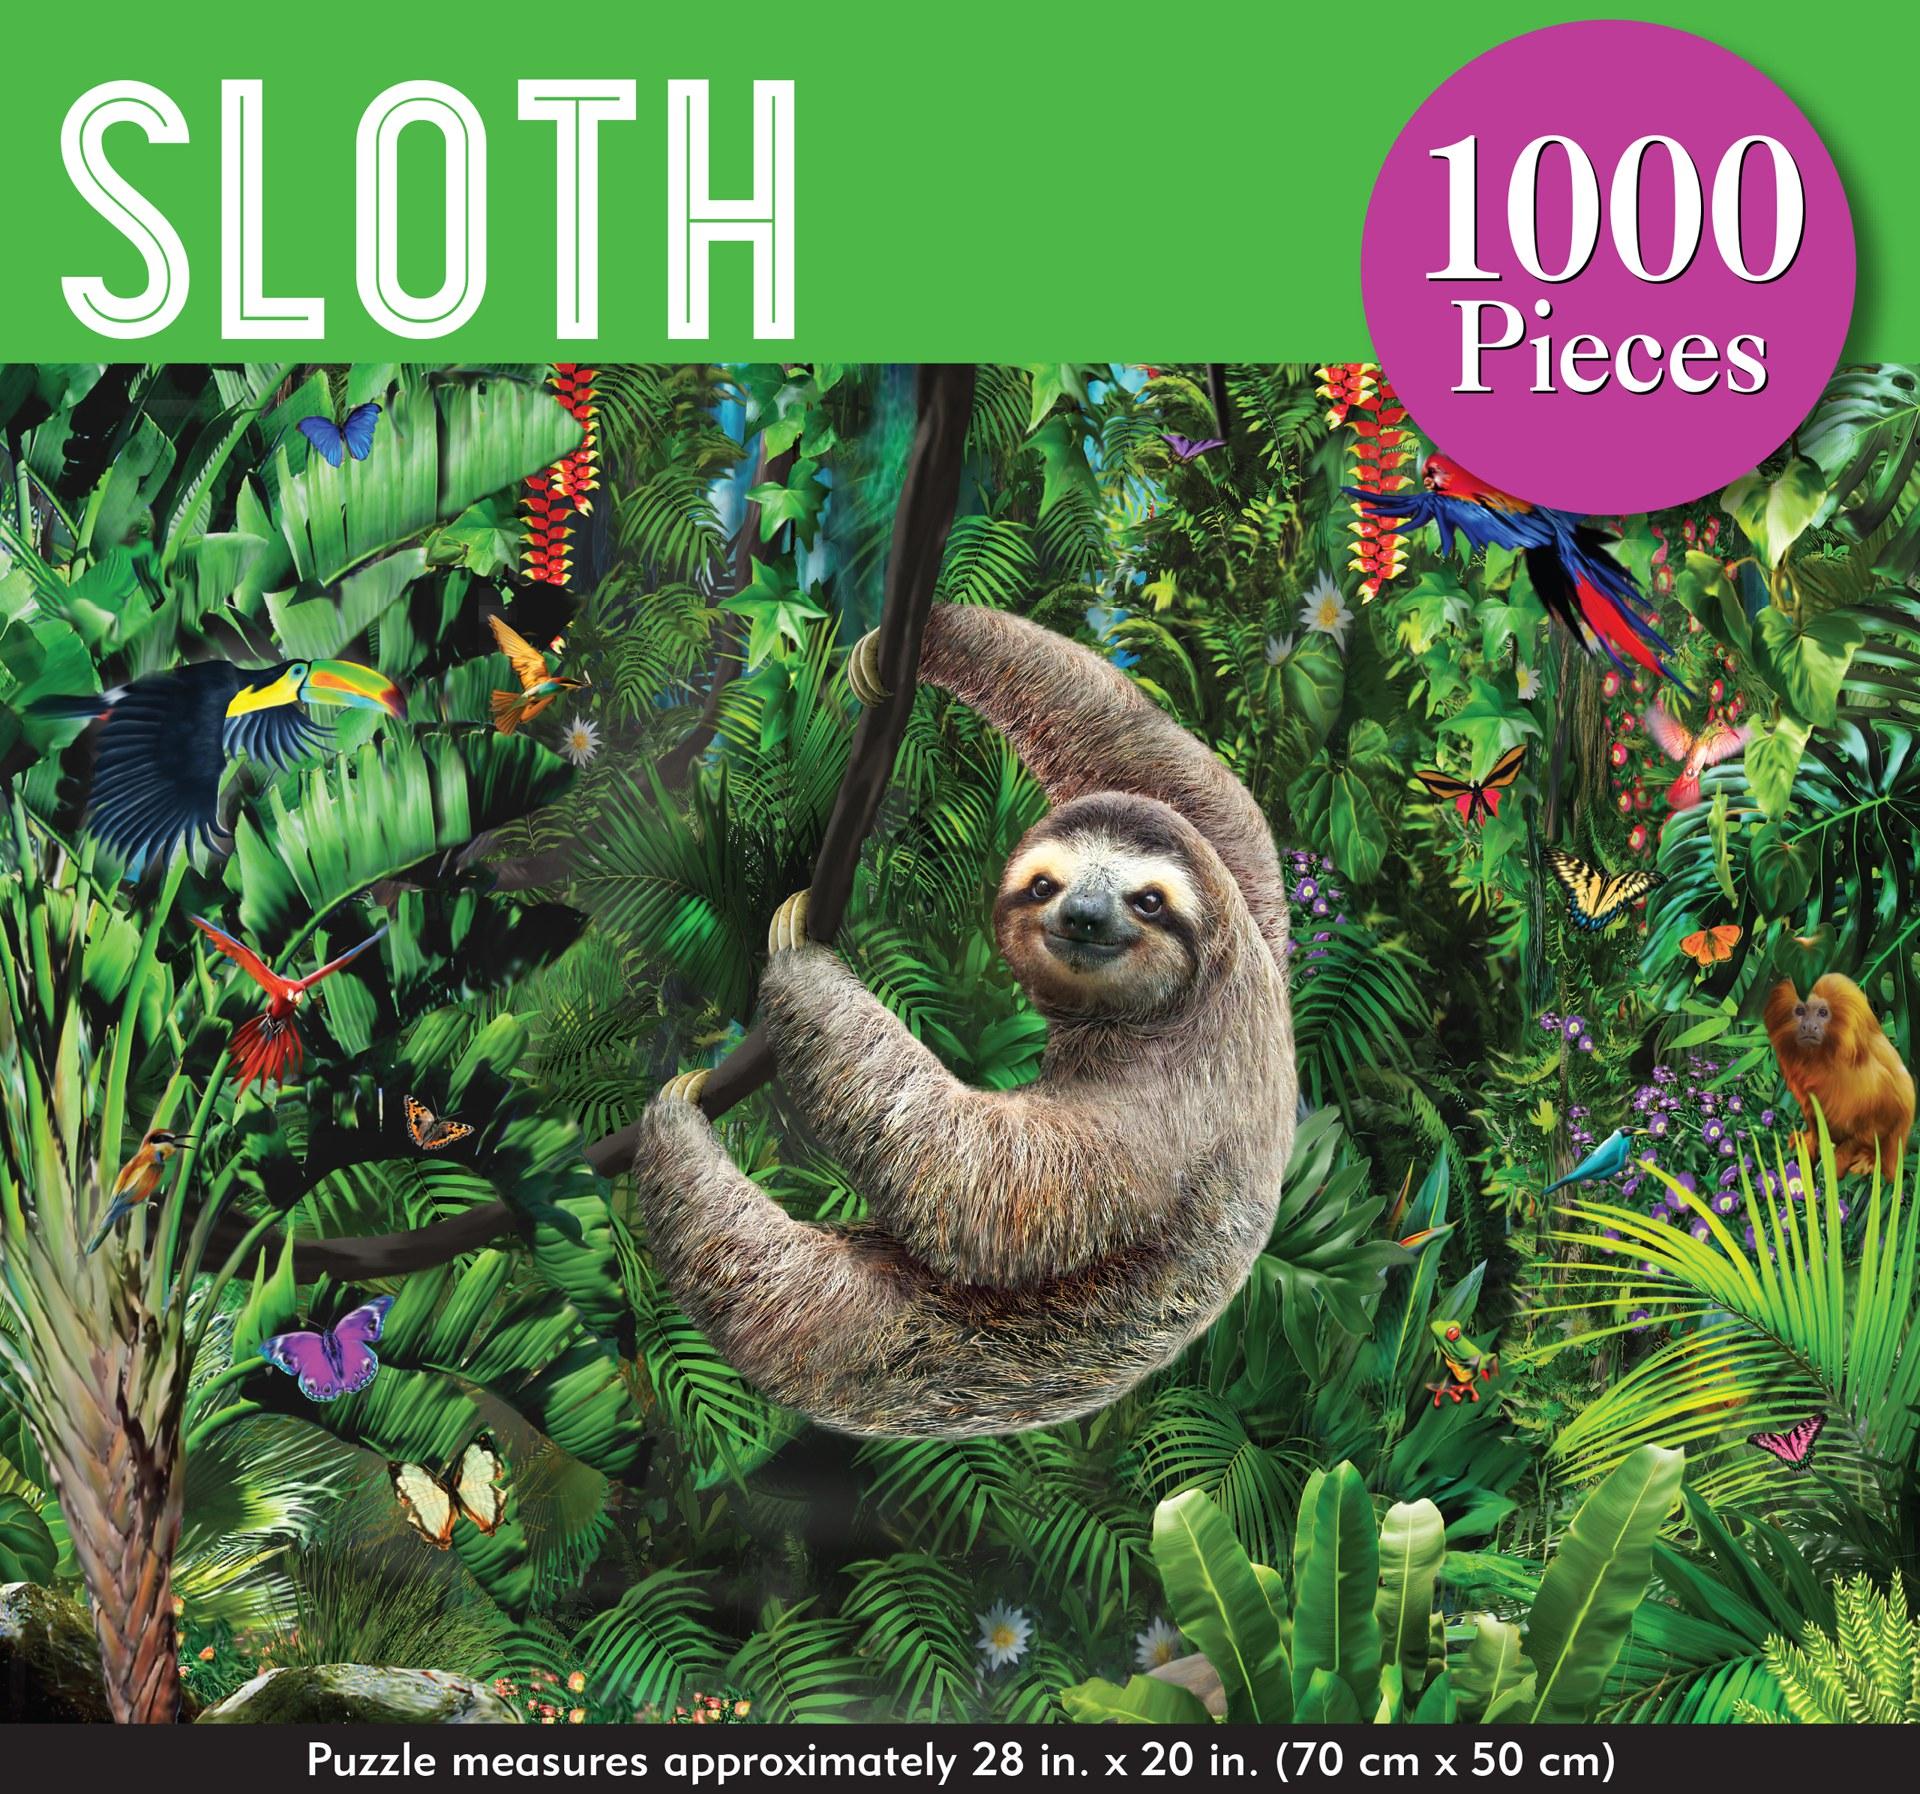 Sloth 1000 Piece Jigsaw Puzzle